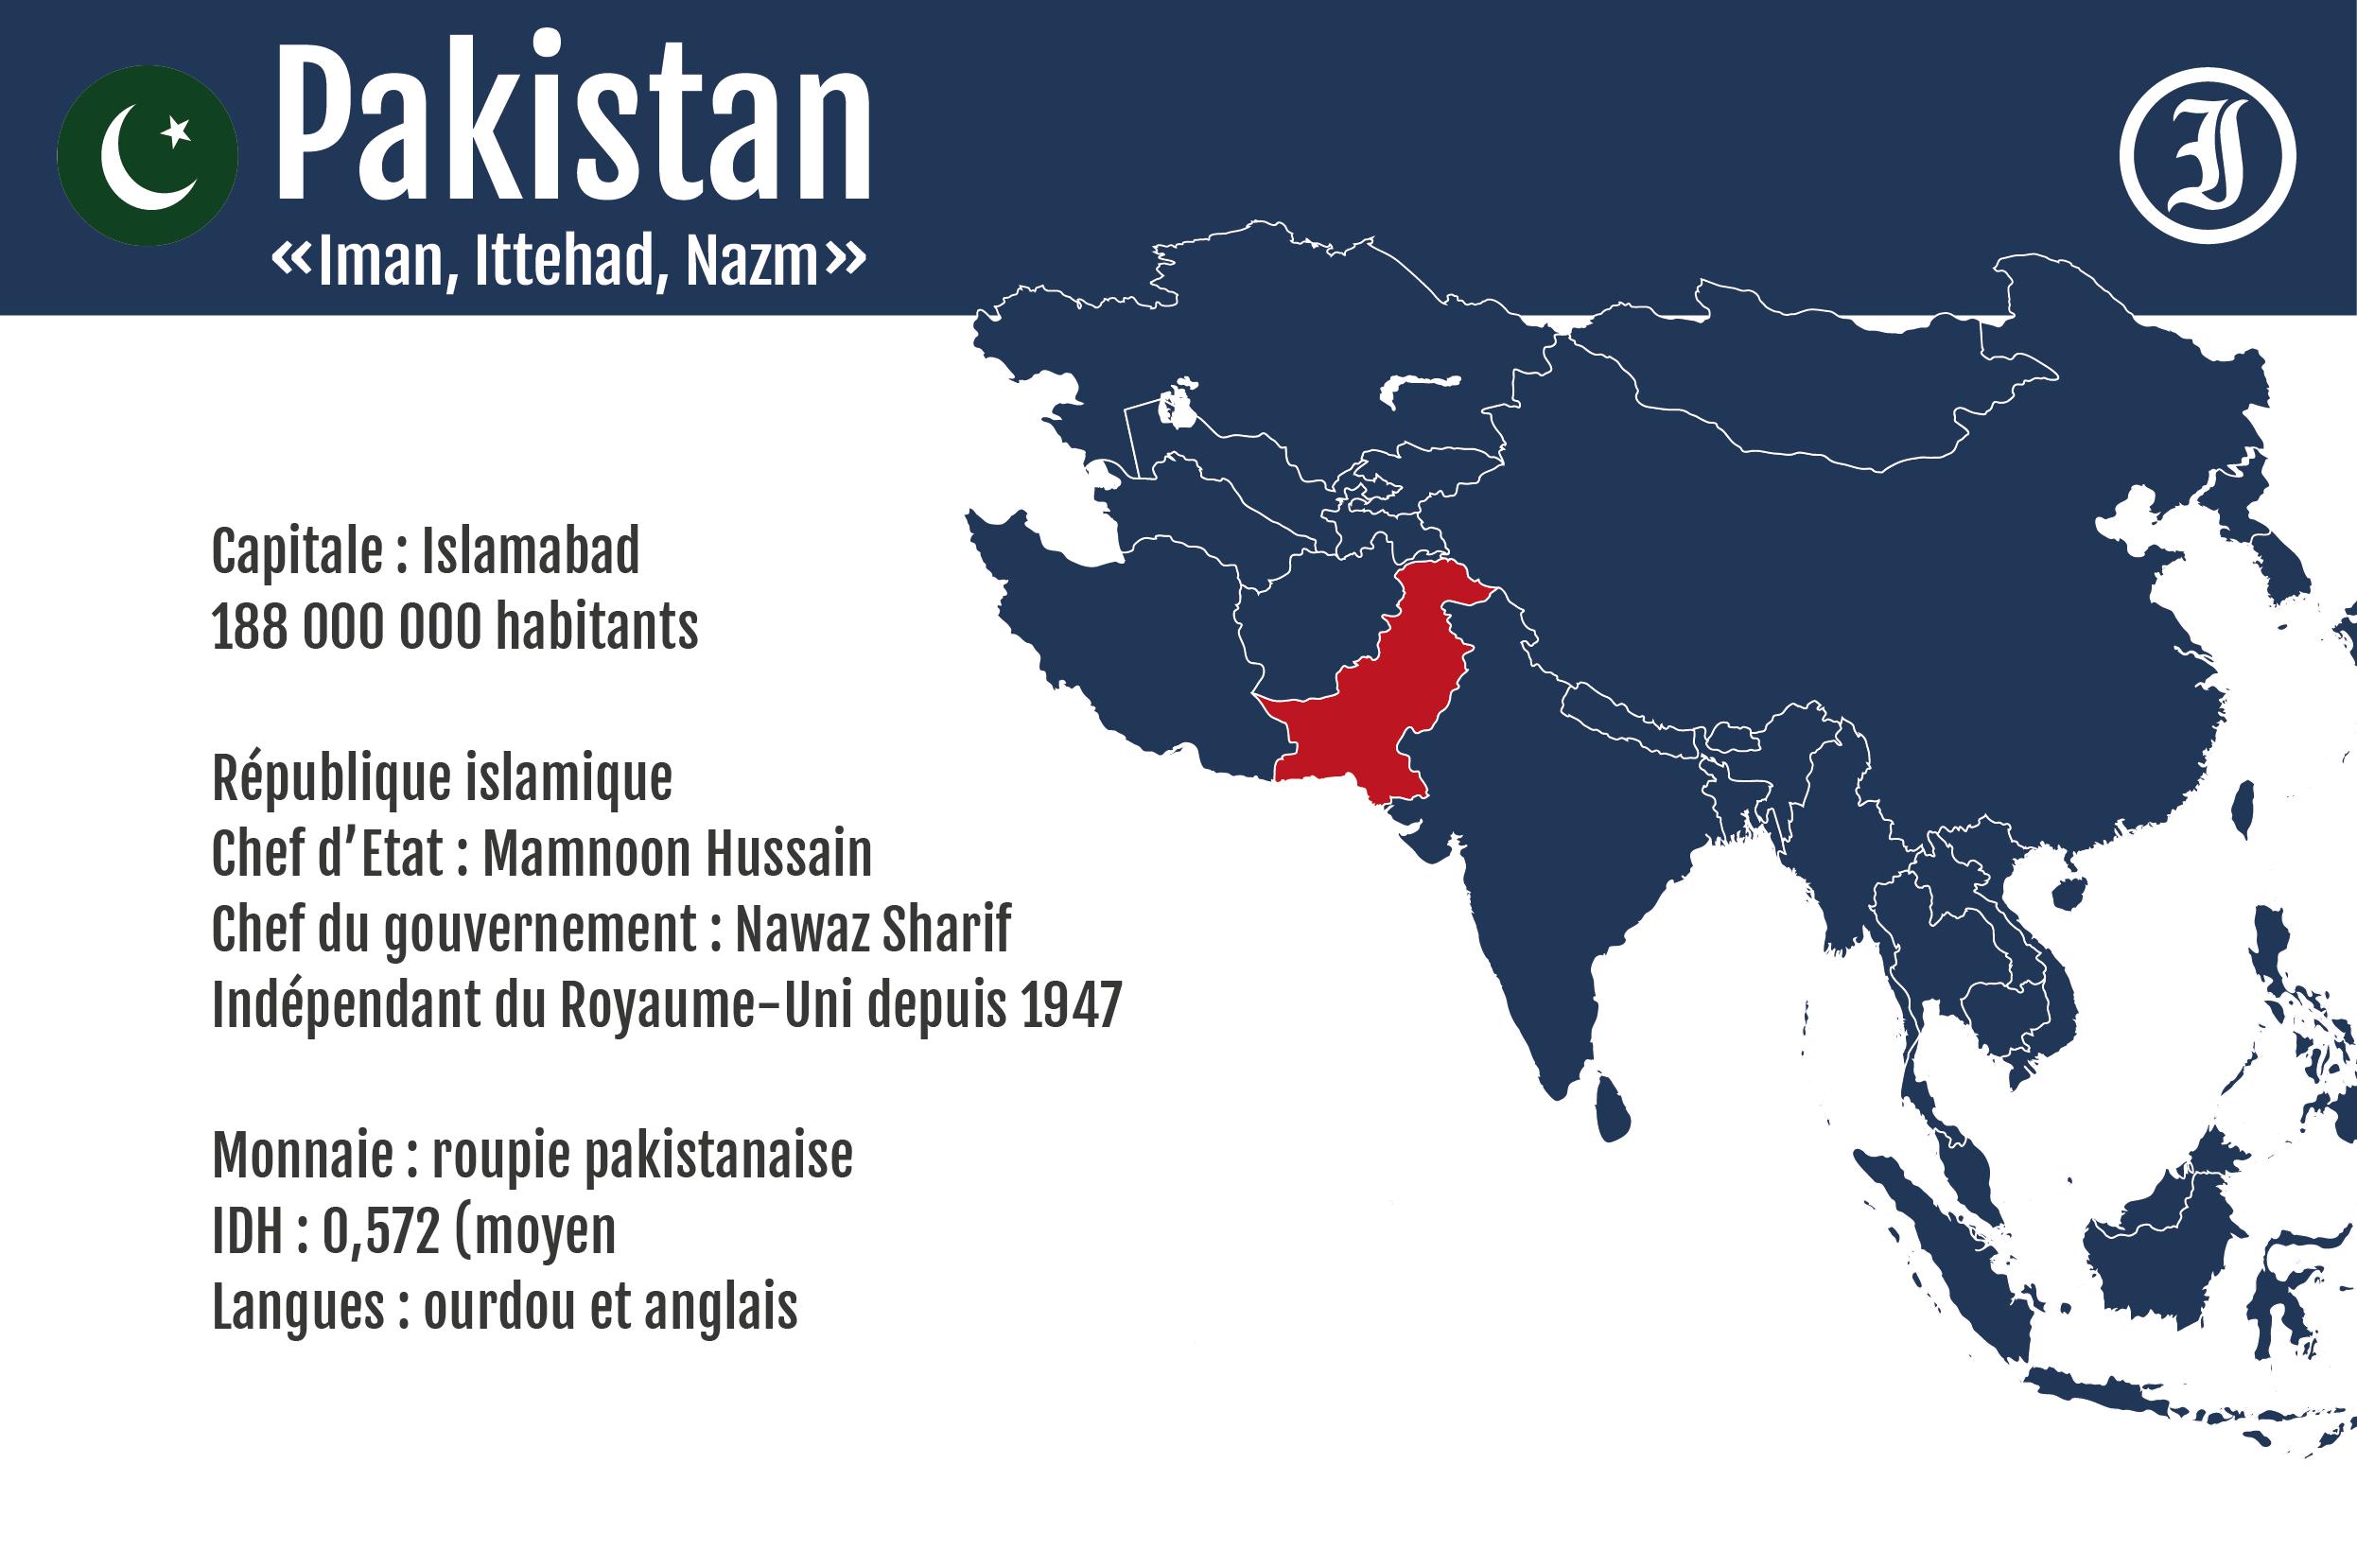 Le Pakistan suspend l'exécution capitale